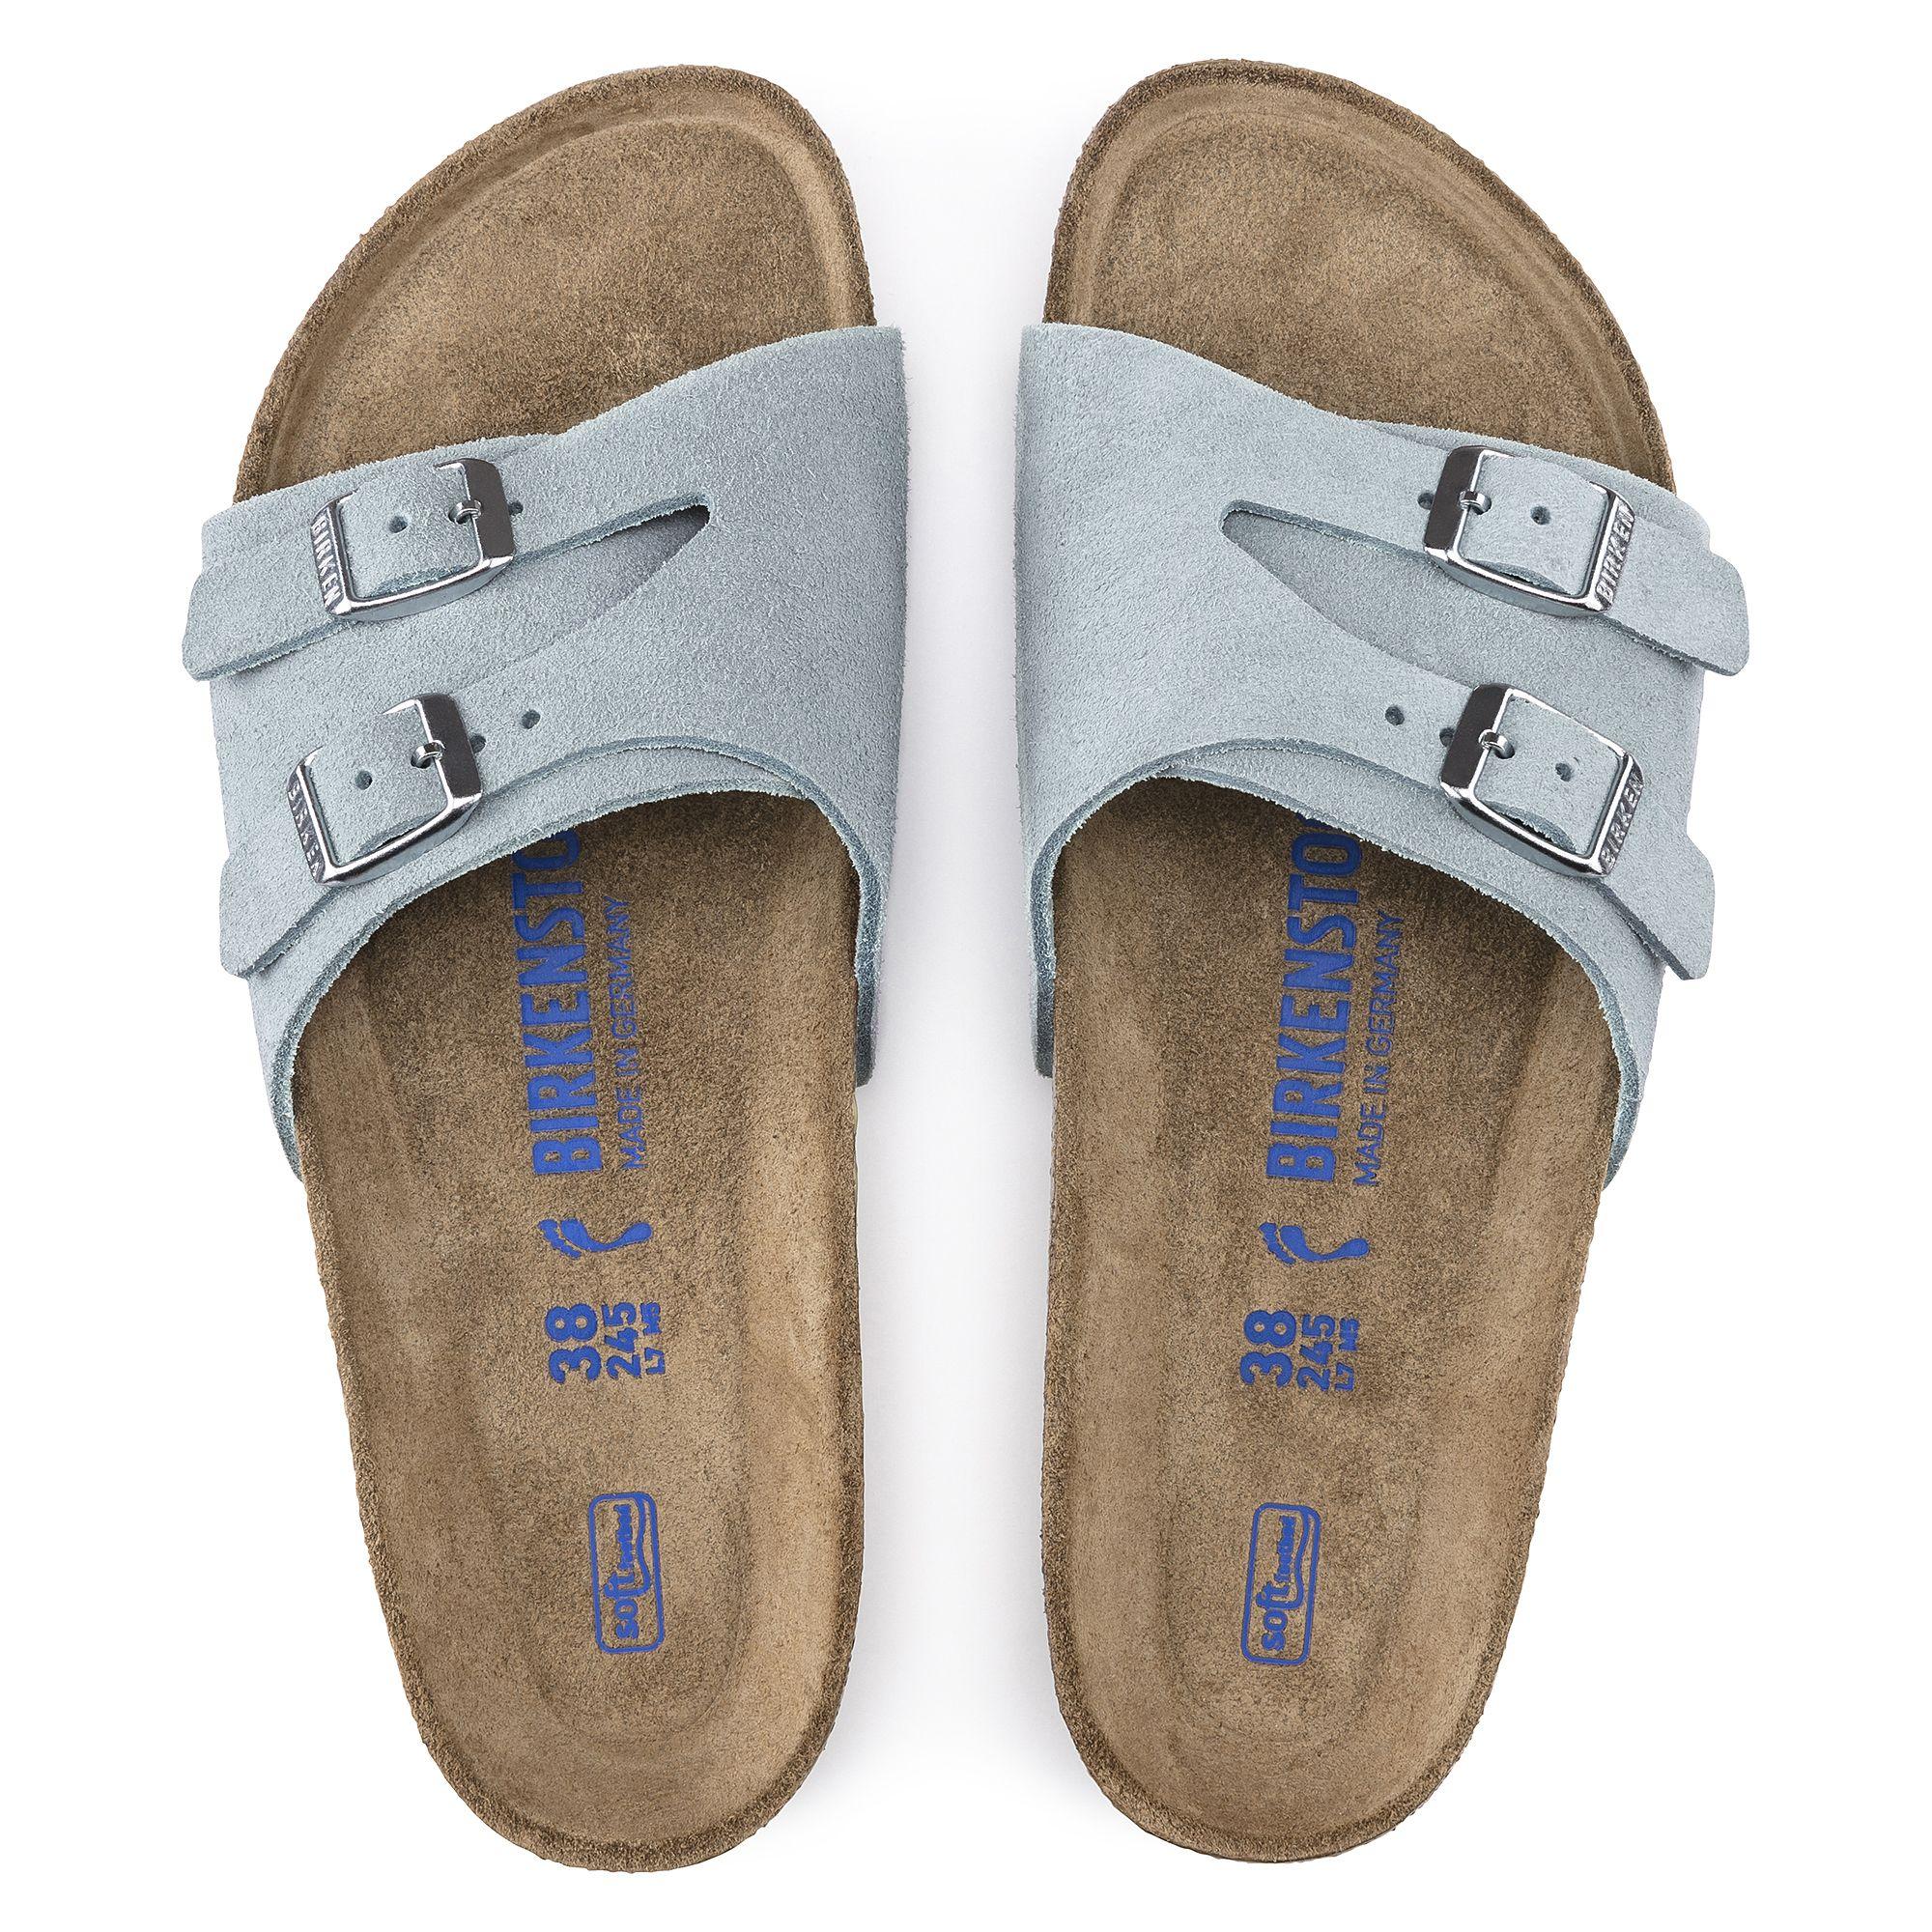 562f4c13c6a Vaduz Suede Soft Footbed Light Blue